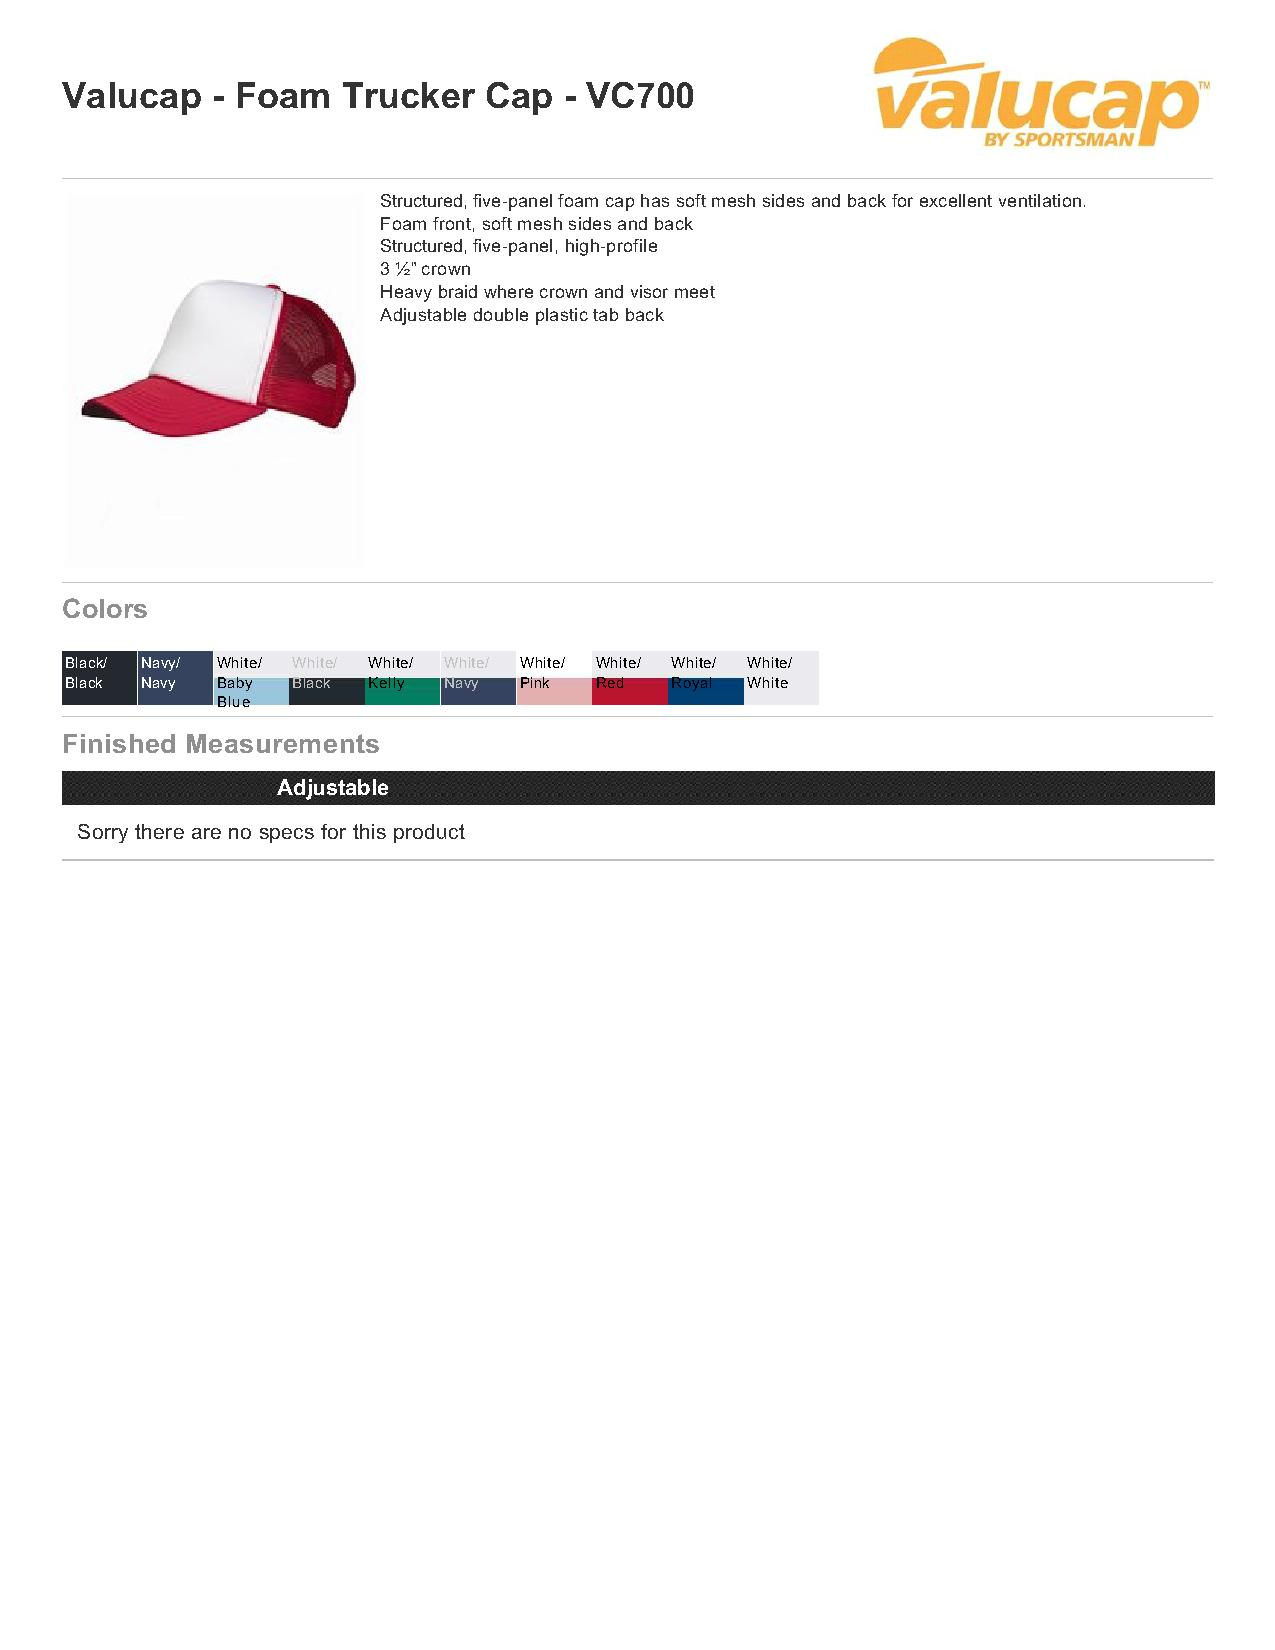 d005f0d515b7a Valucap VC700 - Foam Trucker Cap  2.59 - Headwear